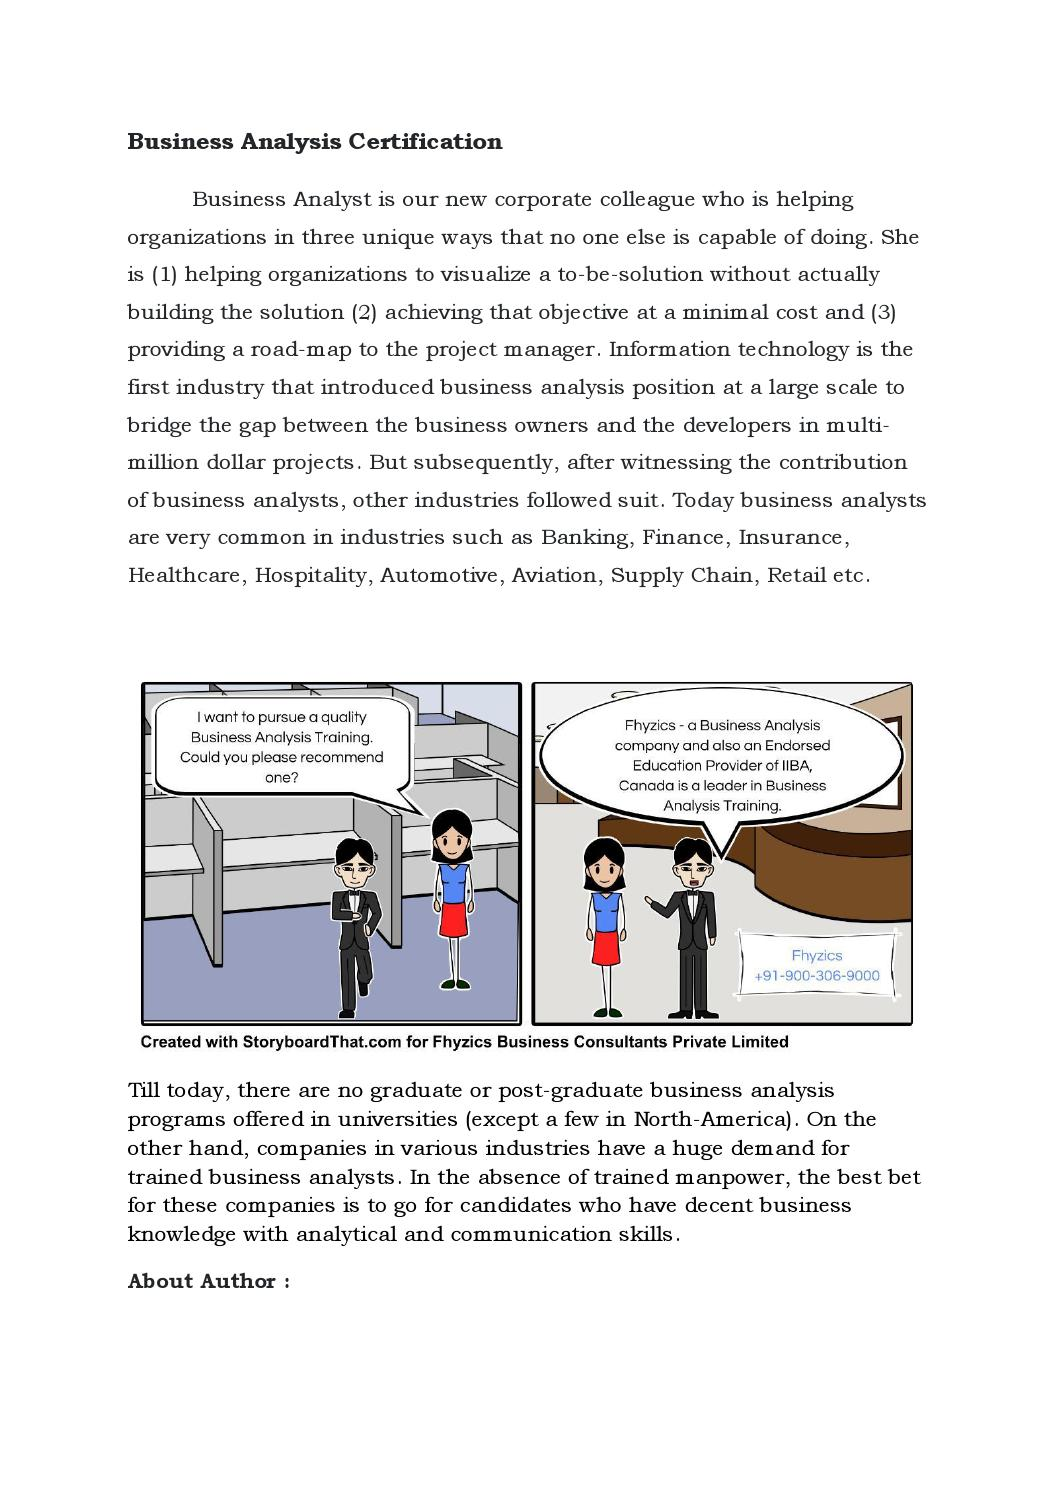 Business Analysis Certification By Kayathri Issuu